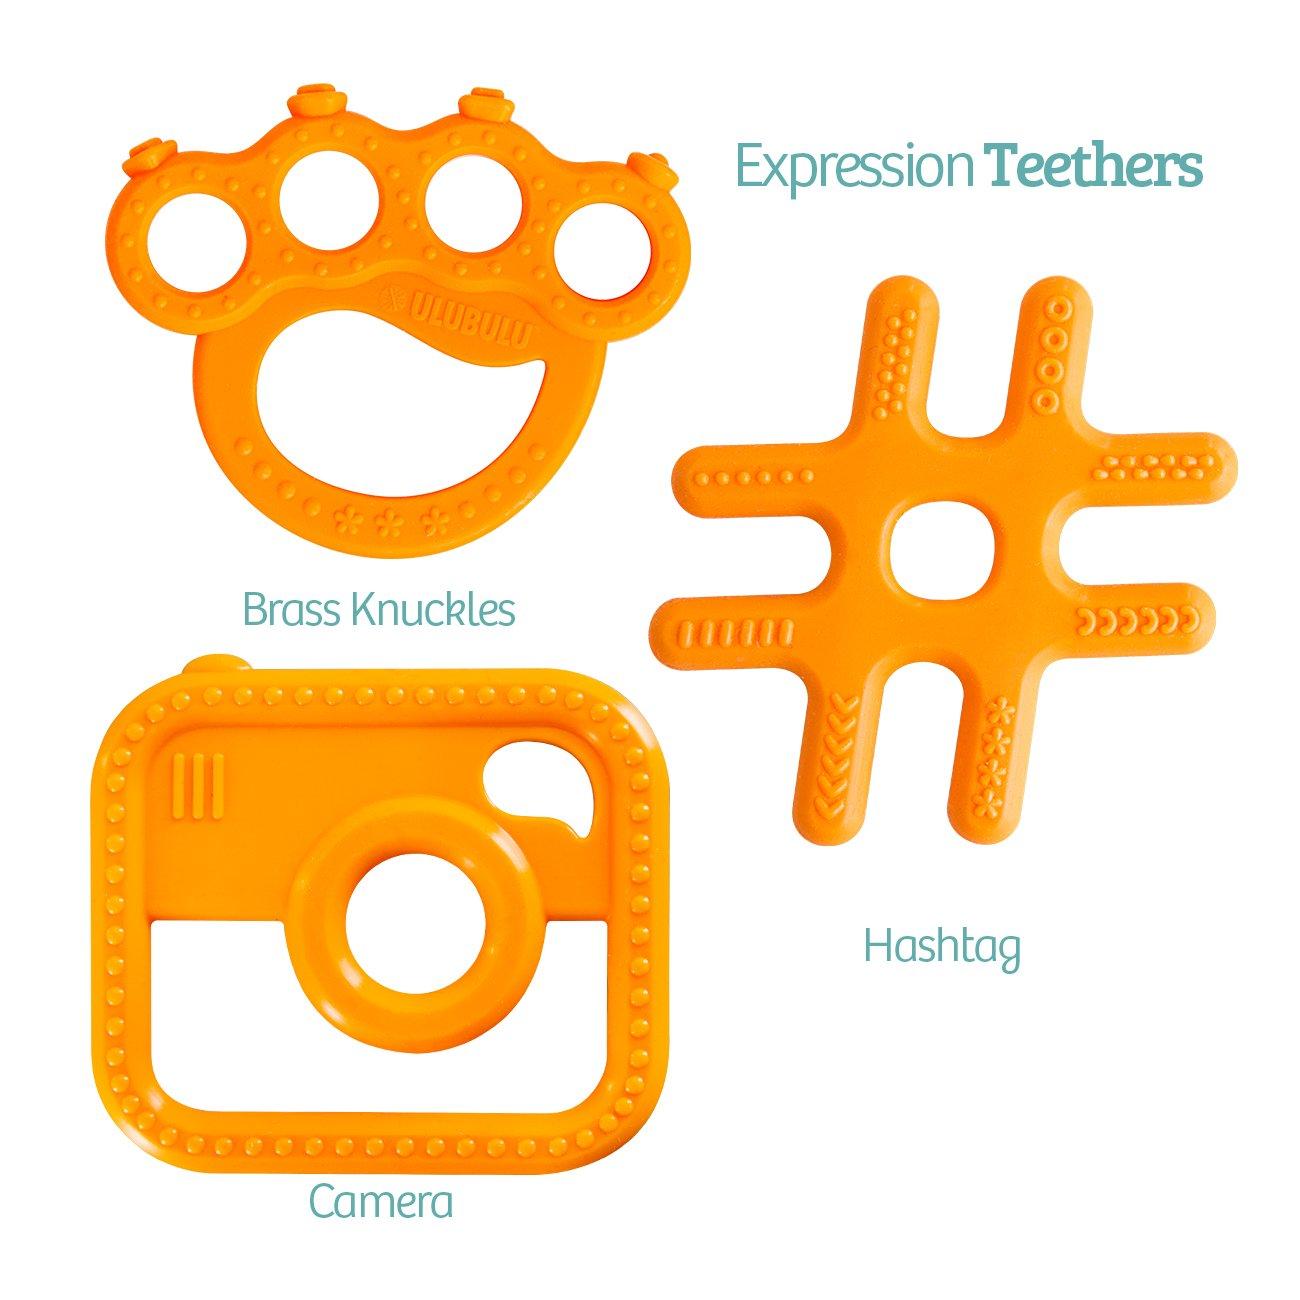 Ulubulu Hashtag Teether and Camera Teether Combo Pack